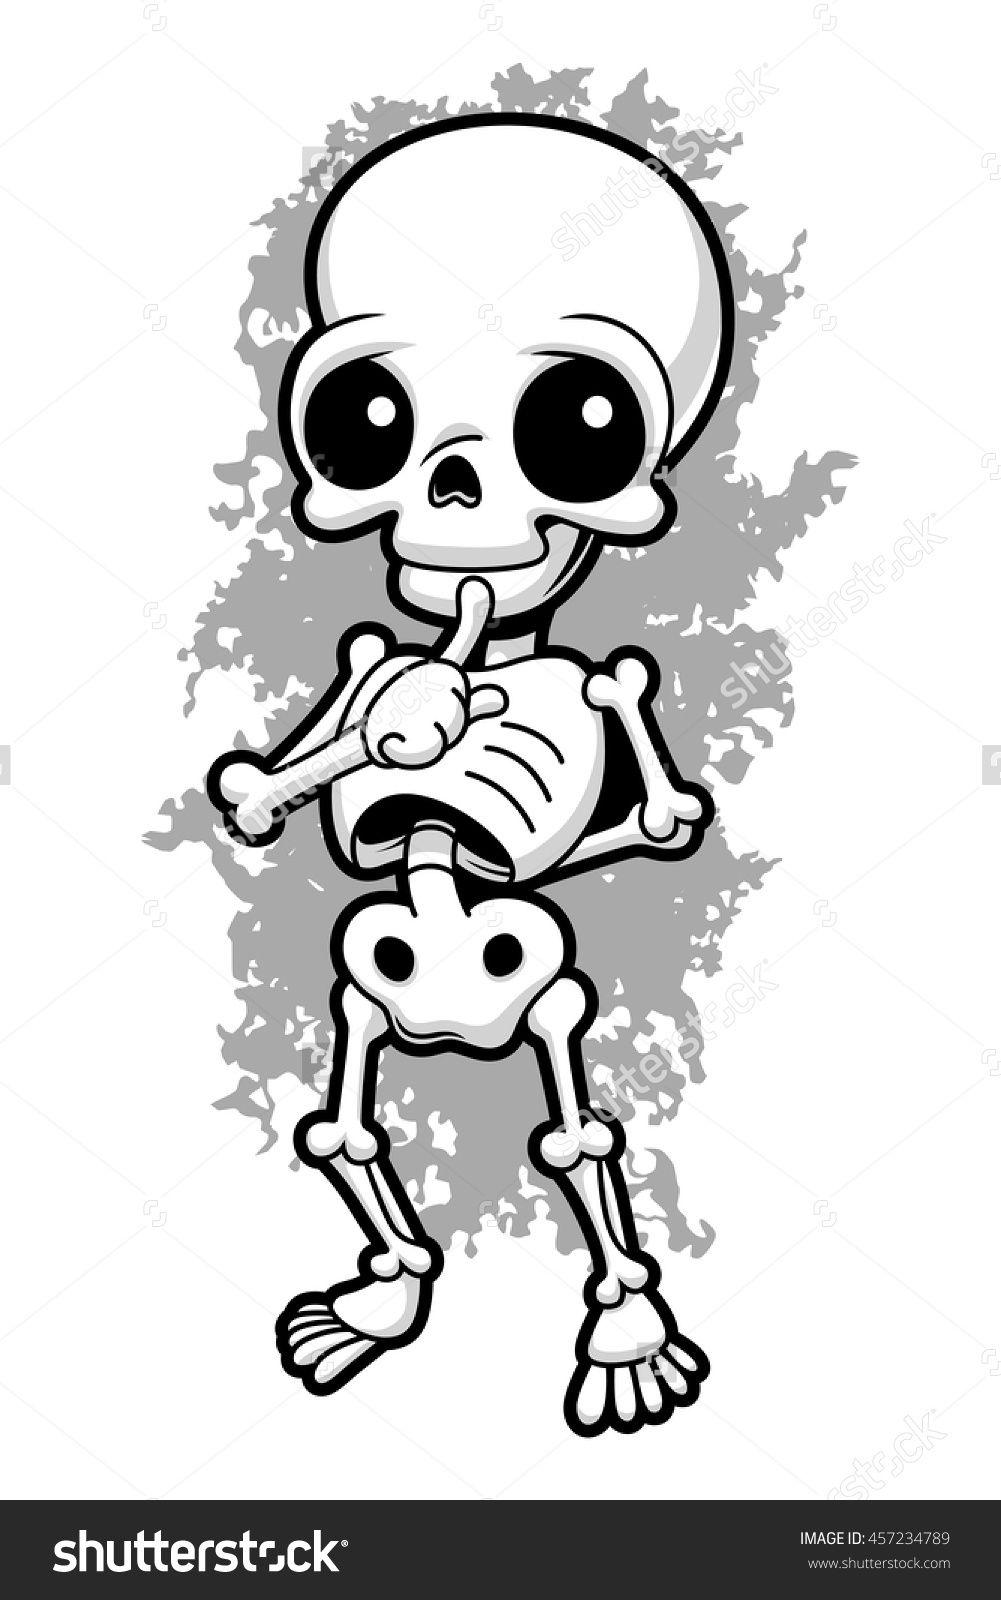 stock vector cartoon cute human skeleton 457234789 jpg jpeg image